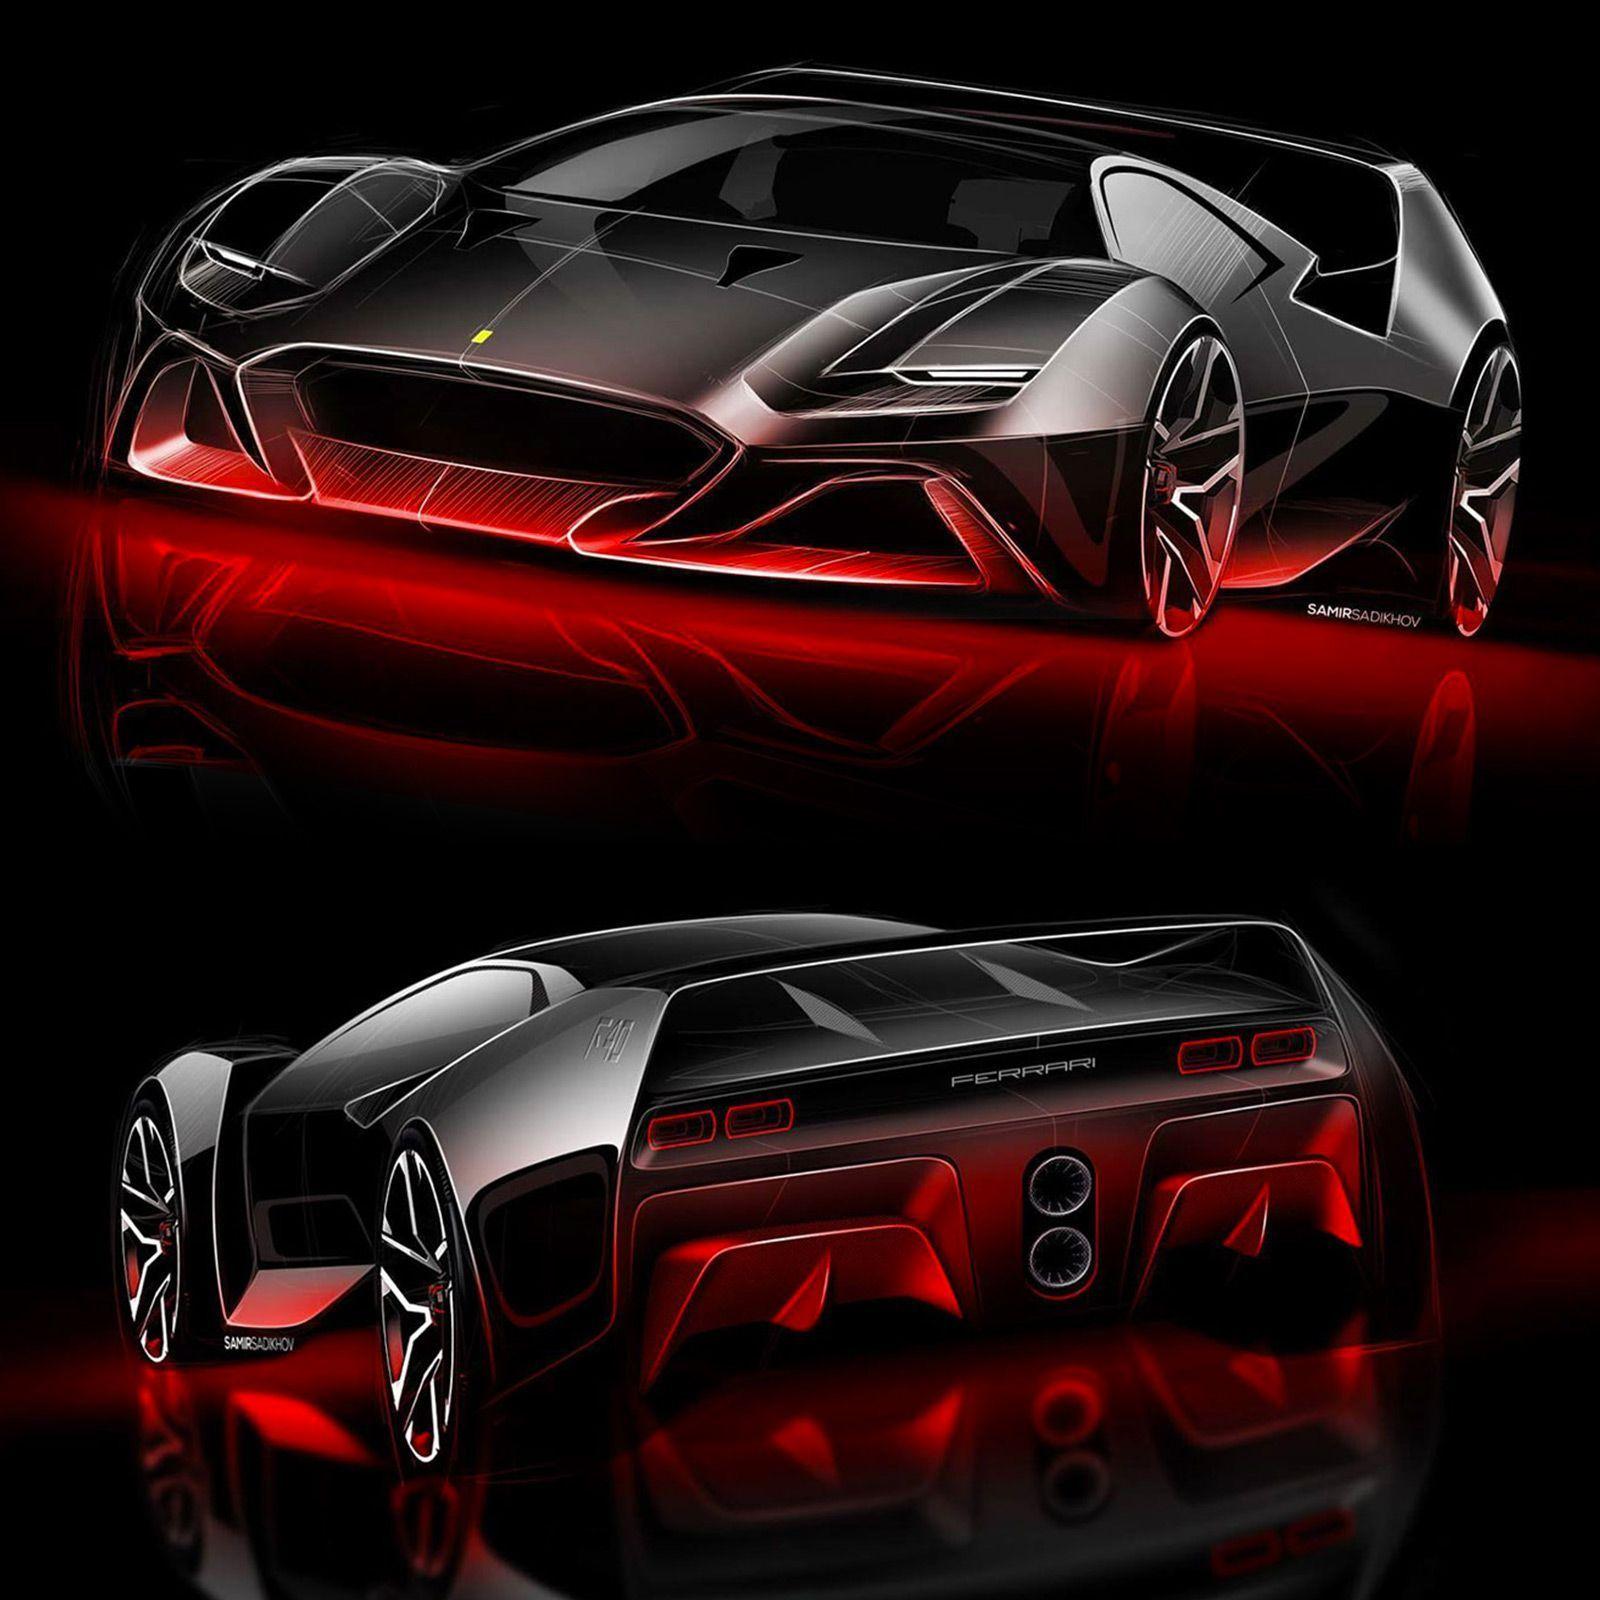 F40 Tribute Concept By Samir Sadikhov: Design Sketches